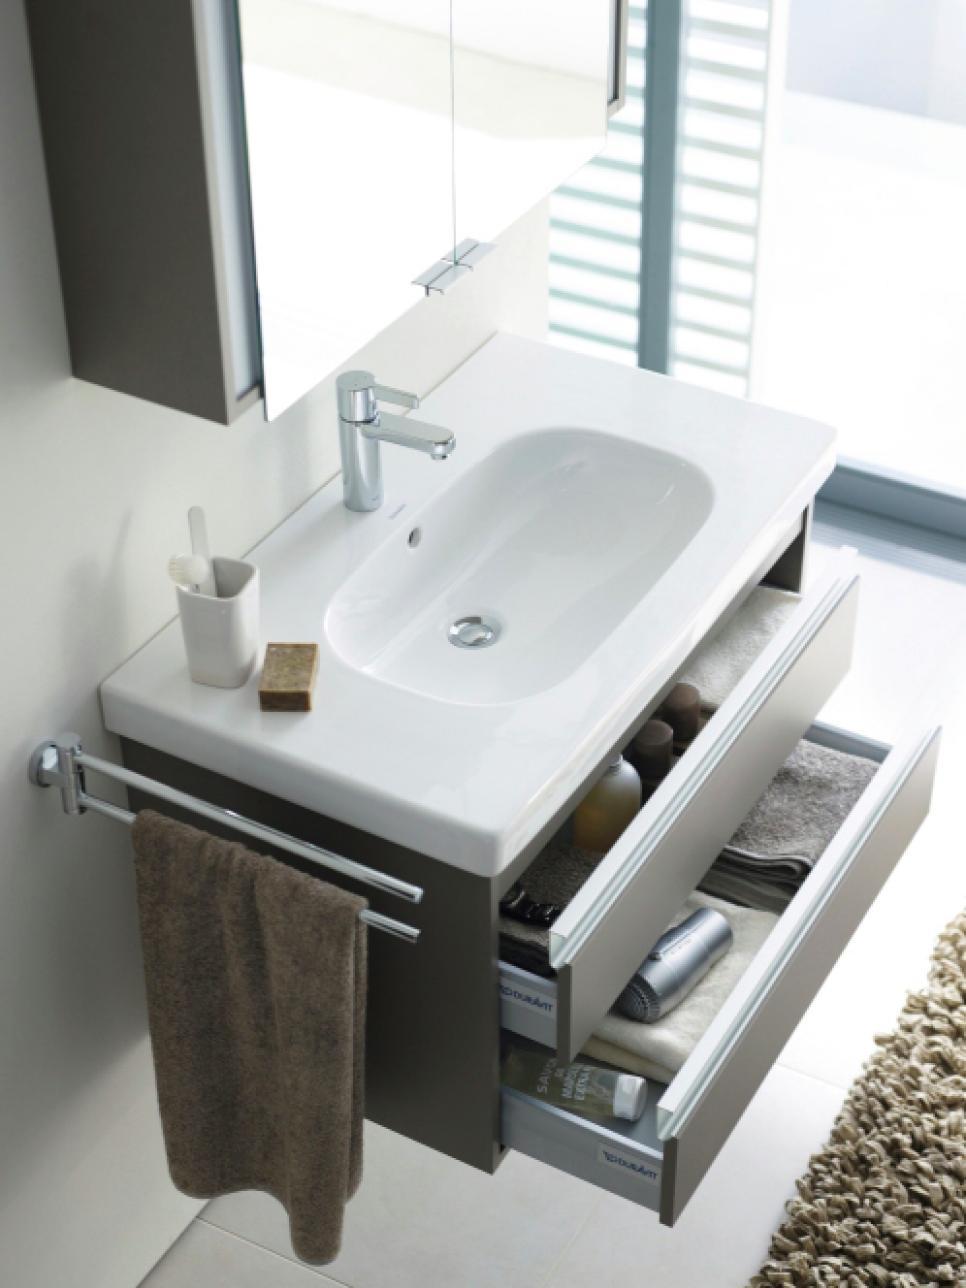 9 bathroom vanity ideas hgtv - Bathroom Cabinet Ideas Design